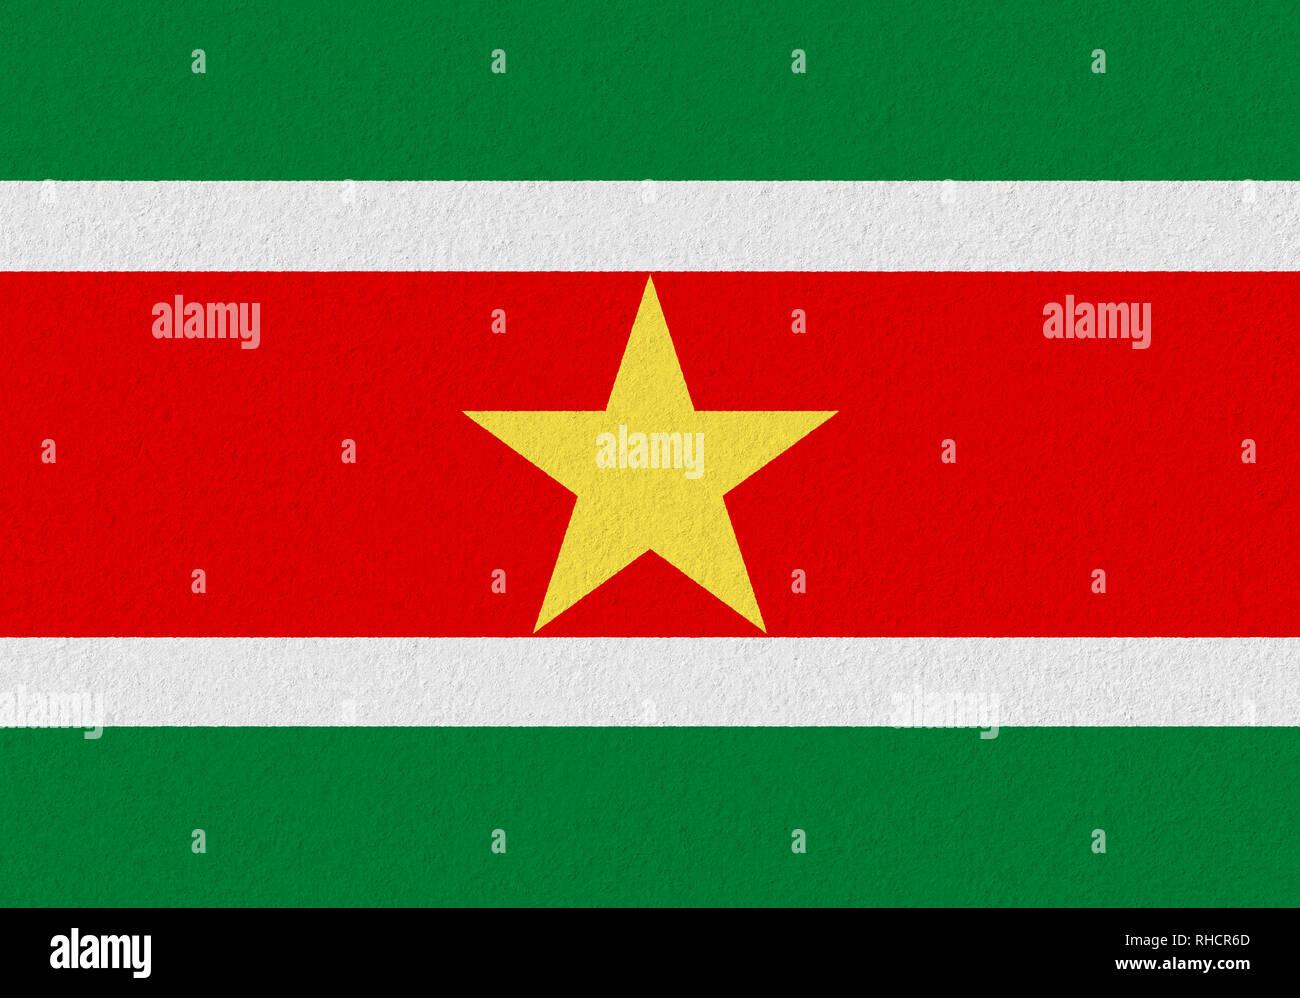 Suriname paper flag. Patriotic background. National flag of Suriname - Stock Image